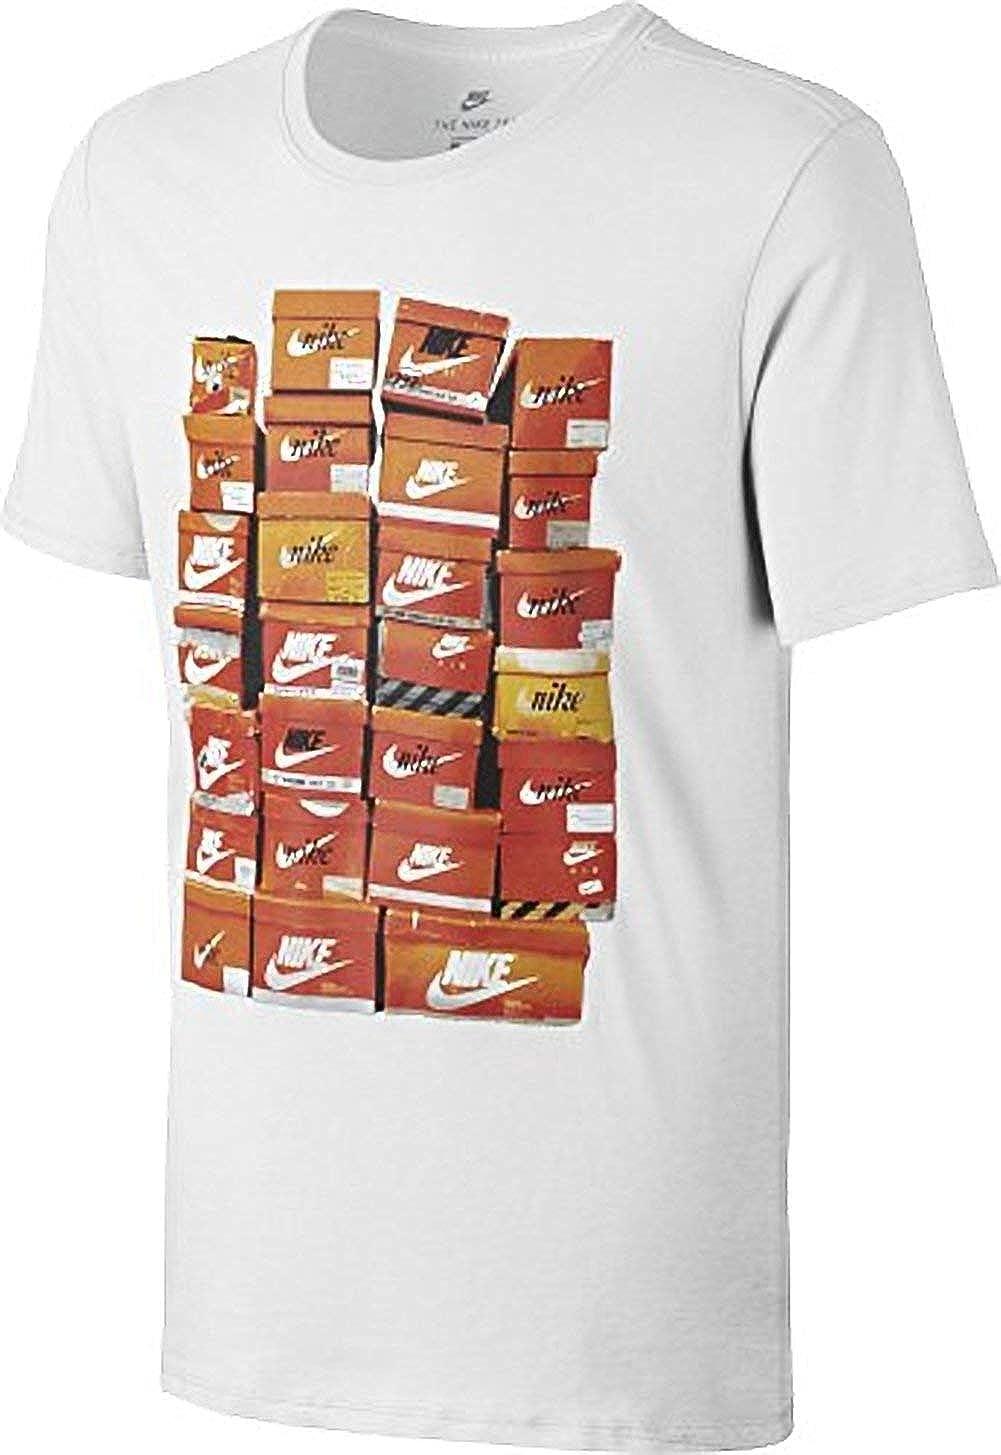 8f190f29a Amazon.com: NIKE Boys Sportswear Vintage Shoe Box T-Shirt (Small, Grey):  Sports & Outdoors